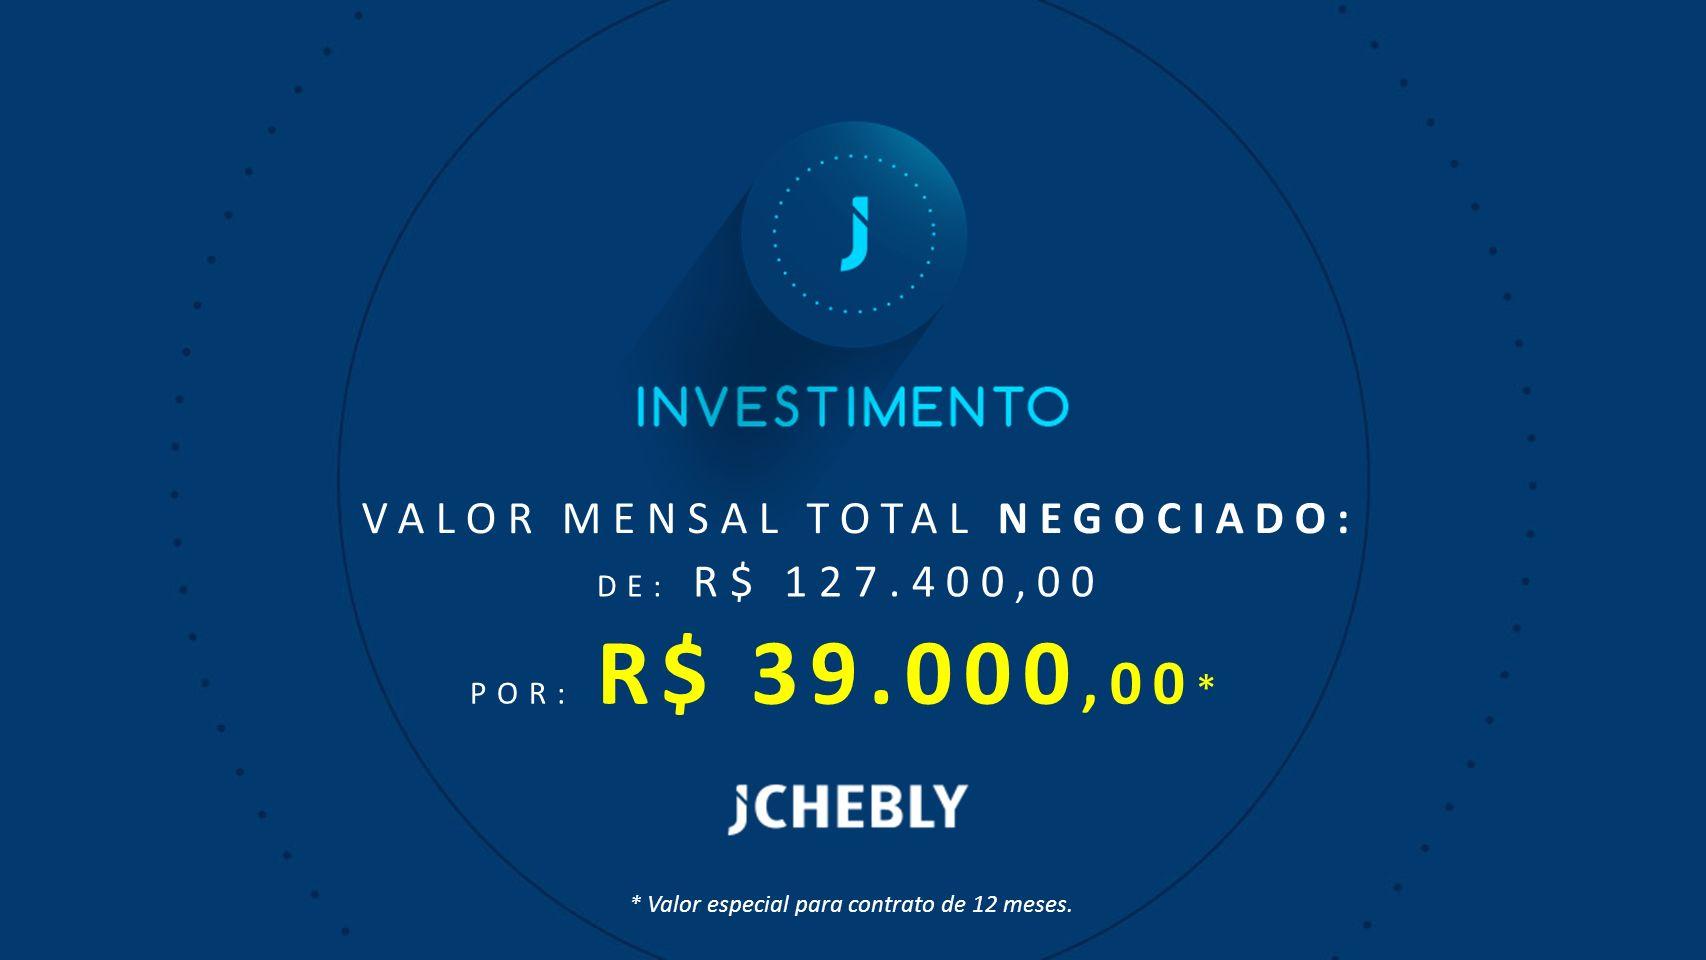 VALOR MENSAL TOTAL NEGOCIADO: DE: R$ 127.400,00 POR: R$ 39.000,00 * * Valor especial para contrato de 12 meses.